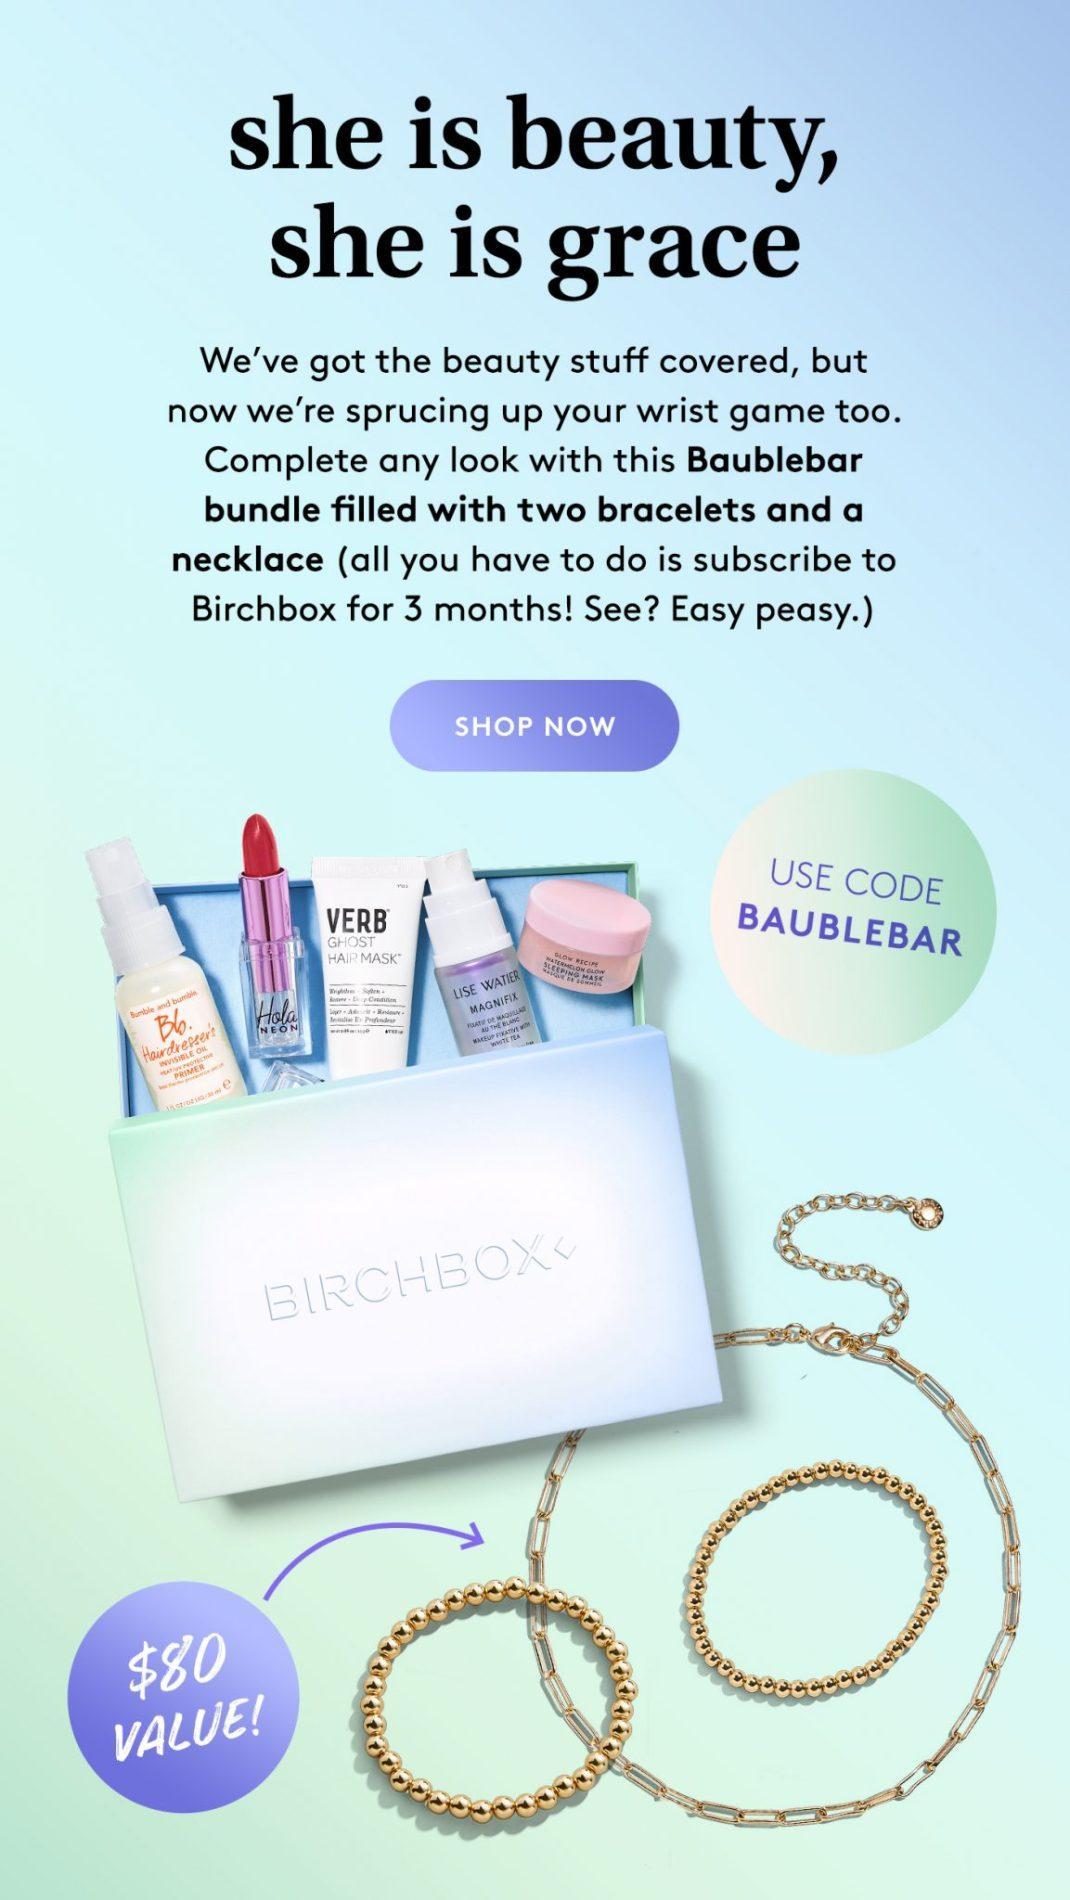 Birchbox – Free Baublebar Bracelet Bundle with New 3-Month Subscription!